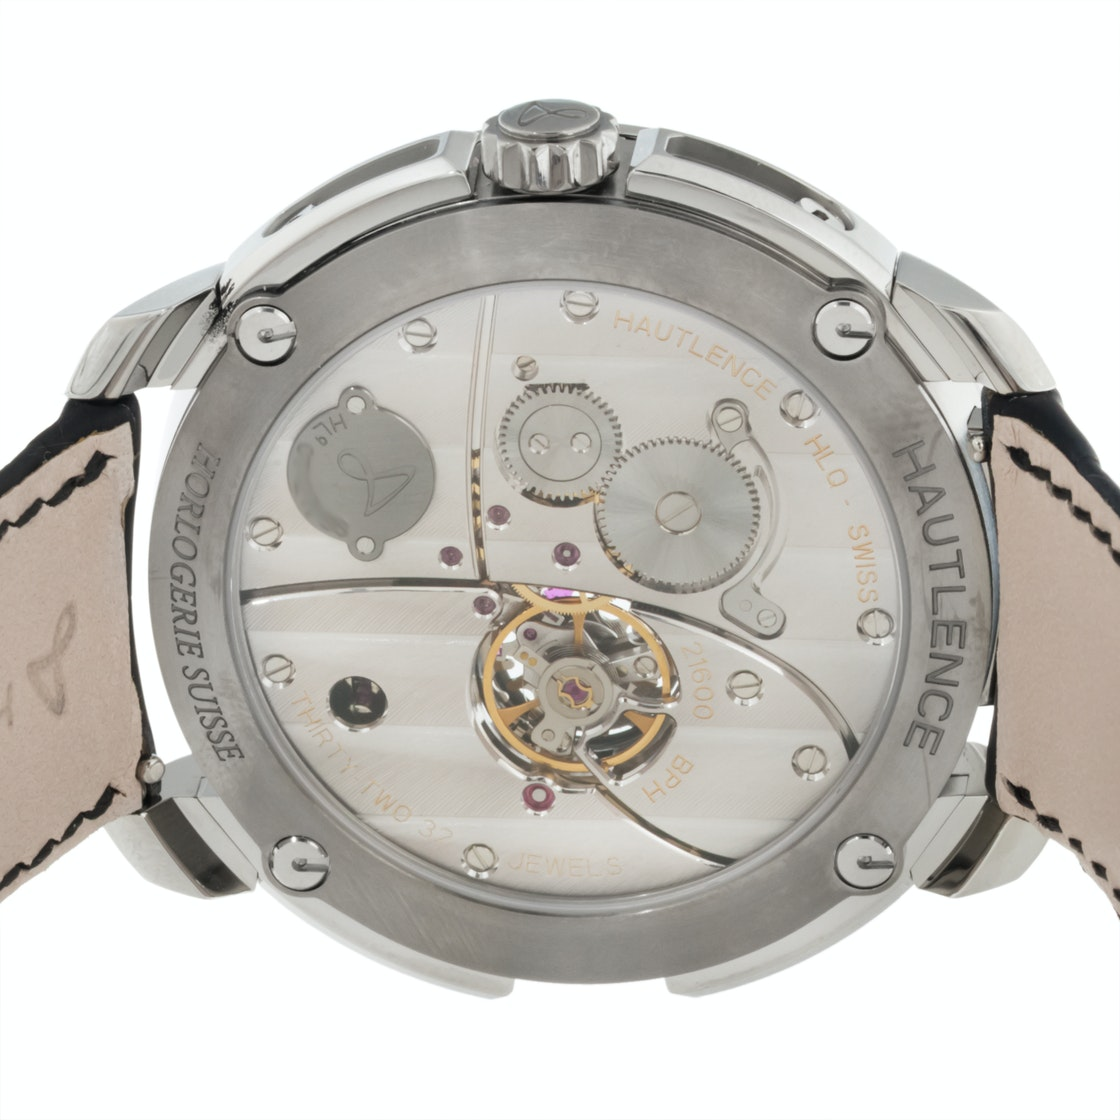 Hautlence HLQ07 Classic Limited Edition MTE002013